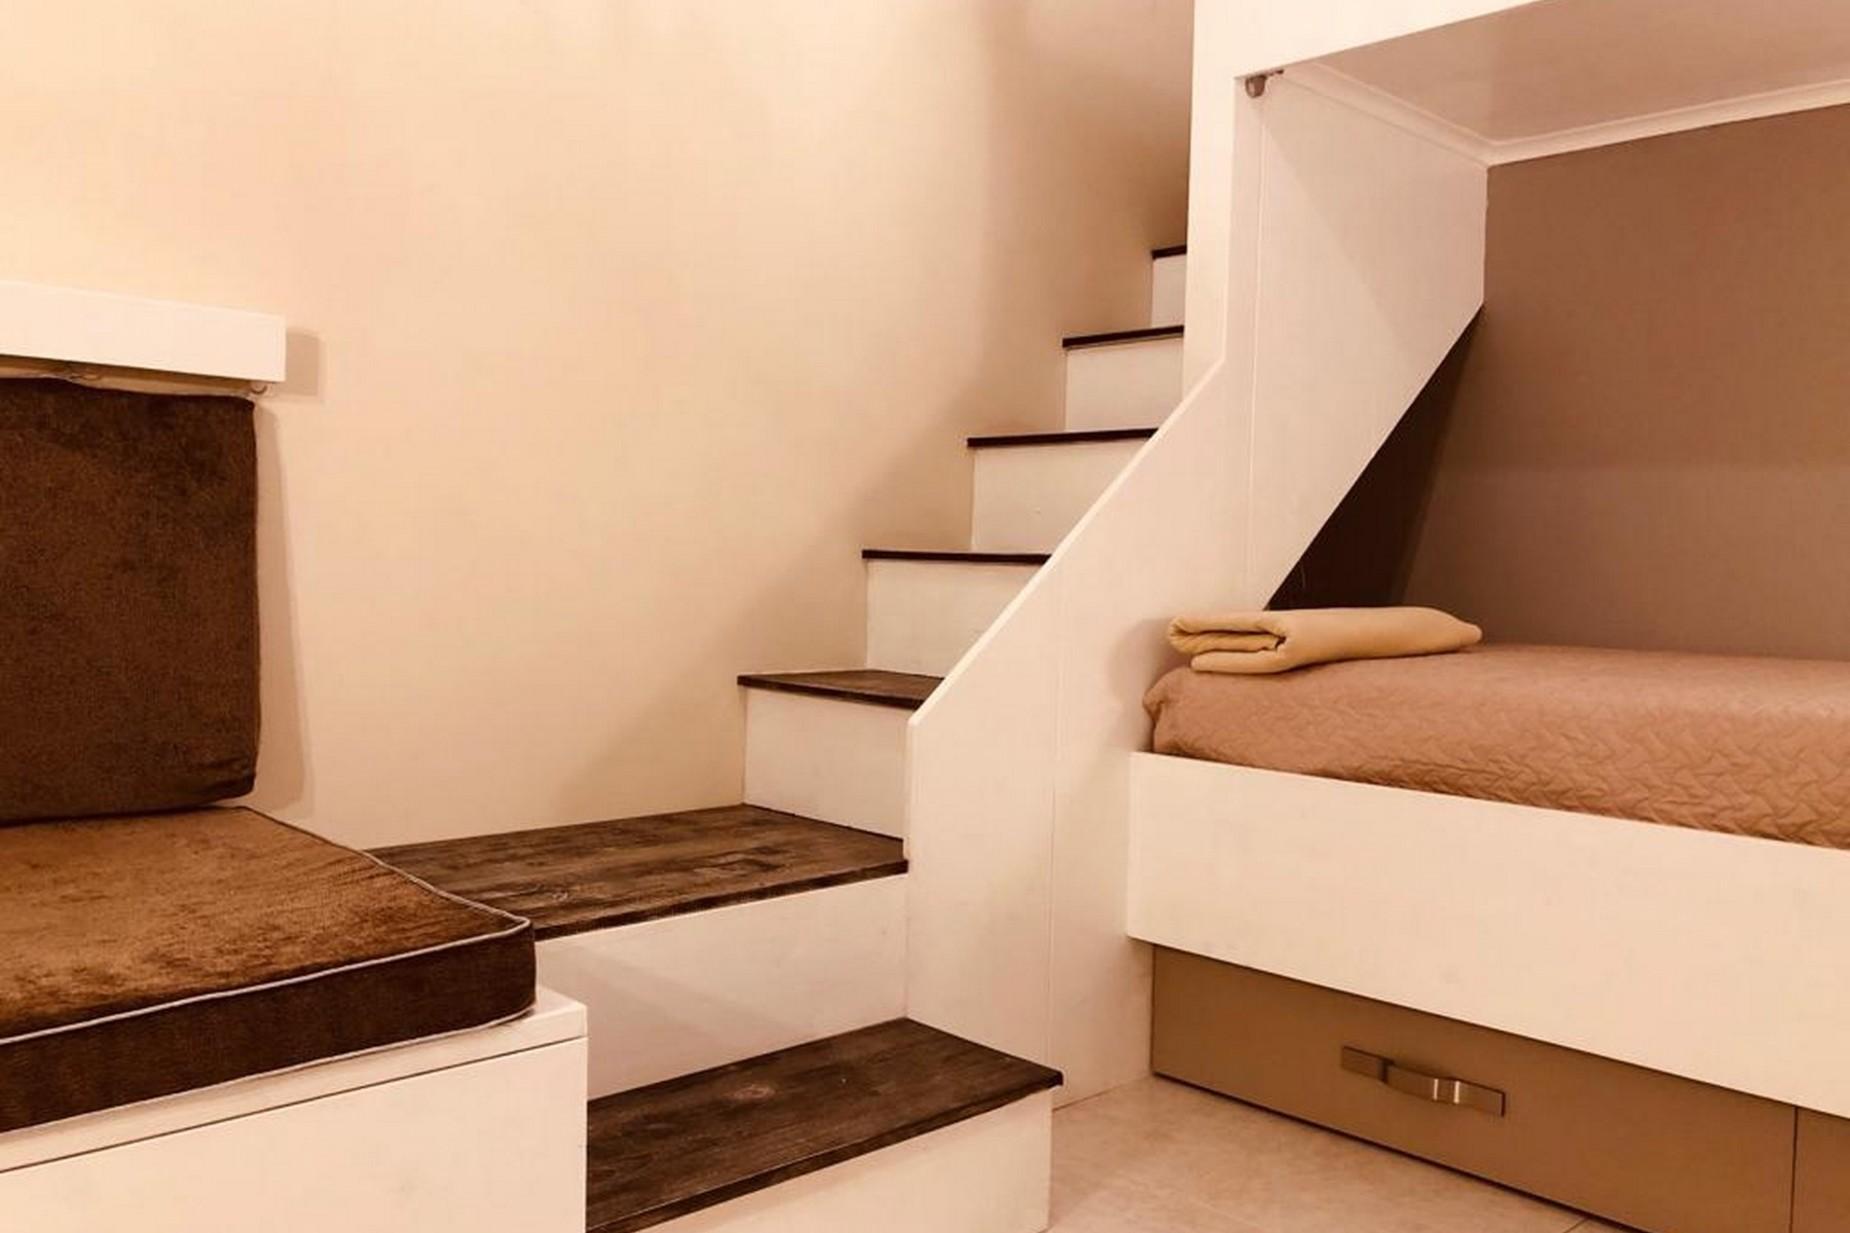 2 bed Apartment For Rent in Senglea, Senglea - thumb 4